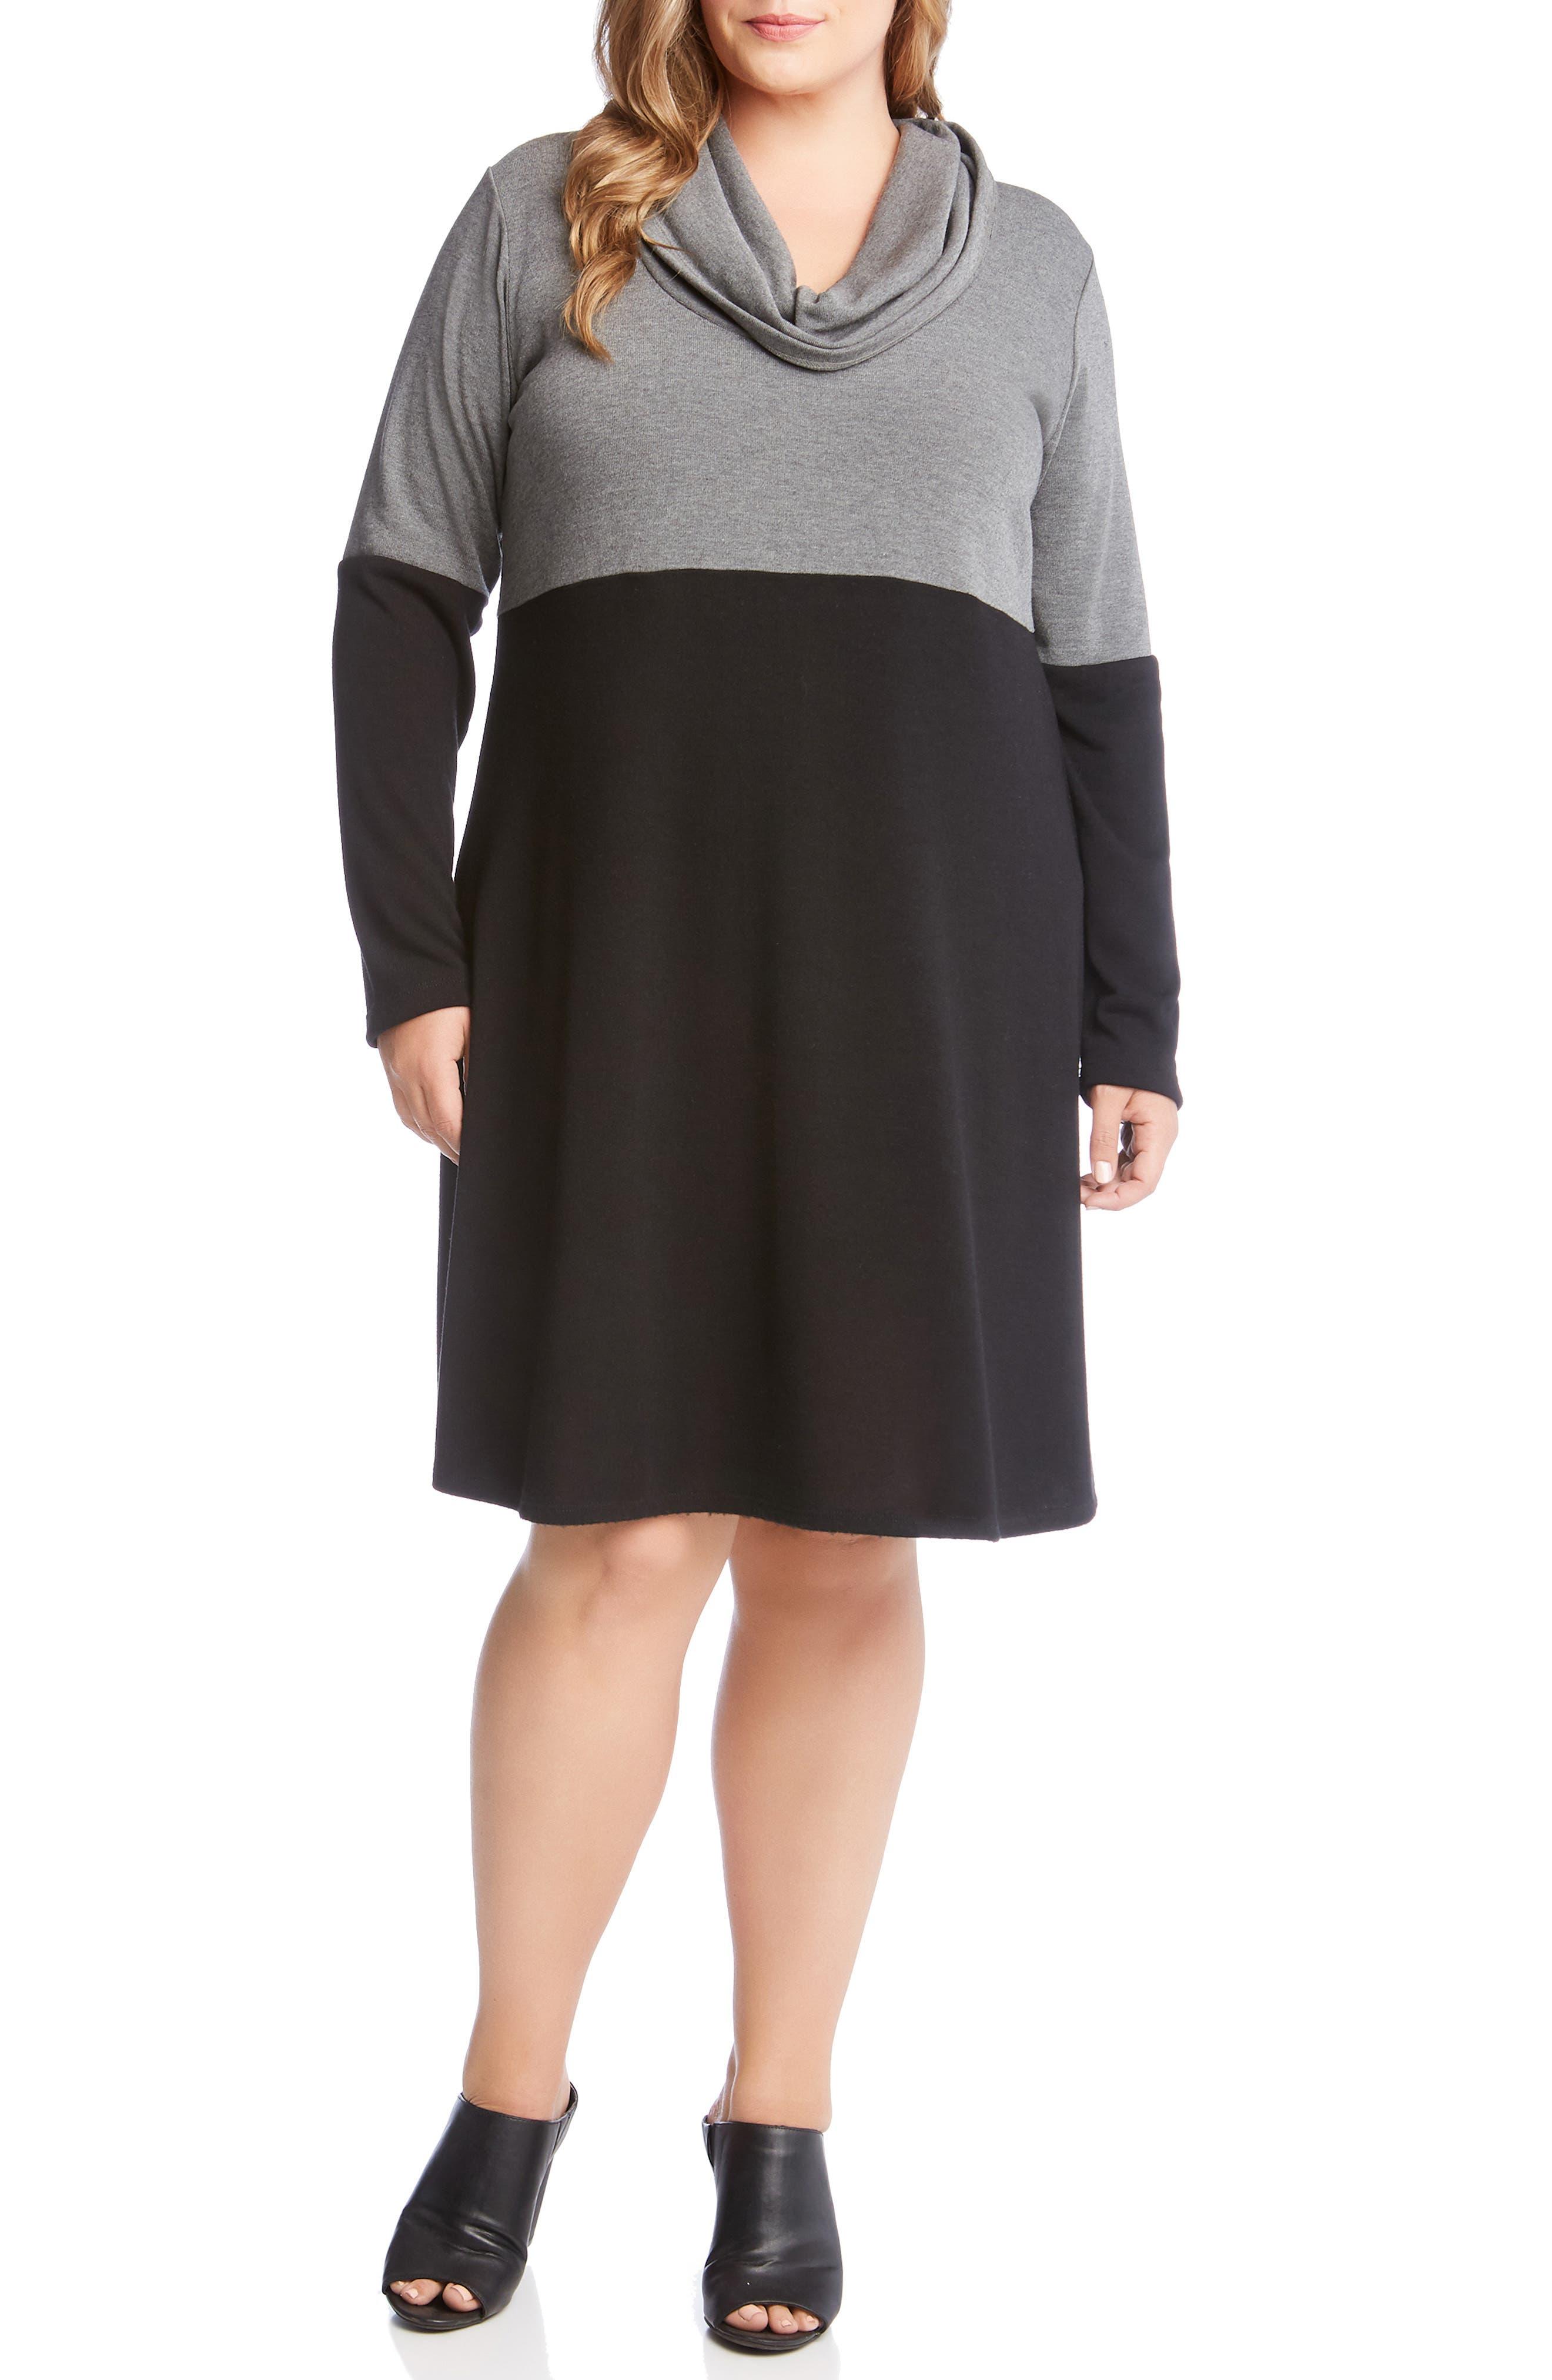 Plus Size Karen Kane Taylor Cowl Neck Colorblock Dress